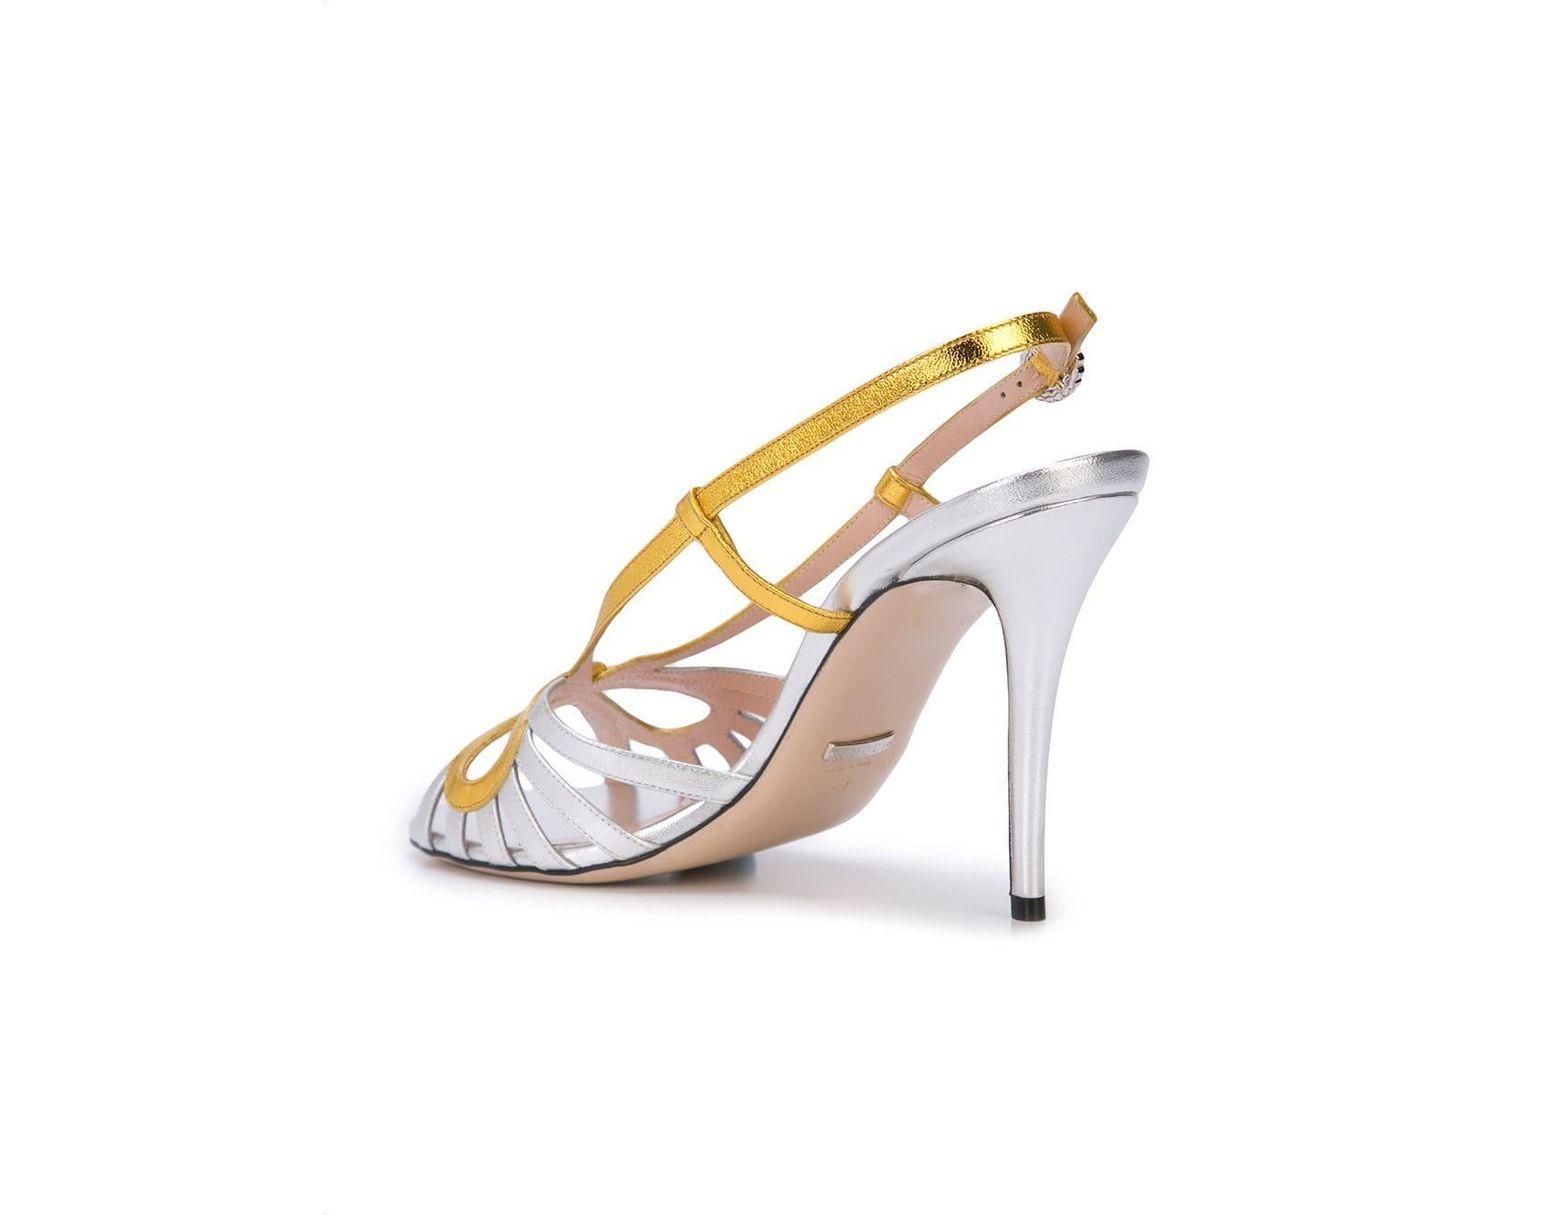 ac2ddc60d Gucci Crossed Bow Sandals in Metallic - Lyst